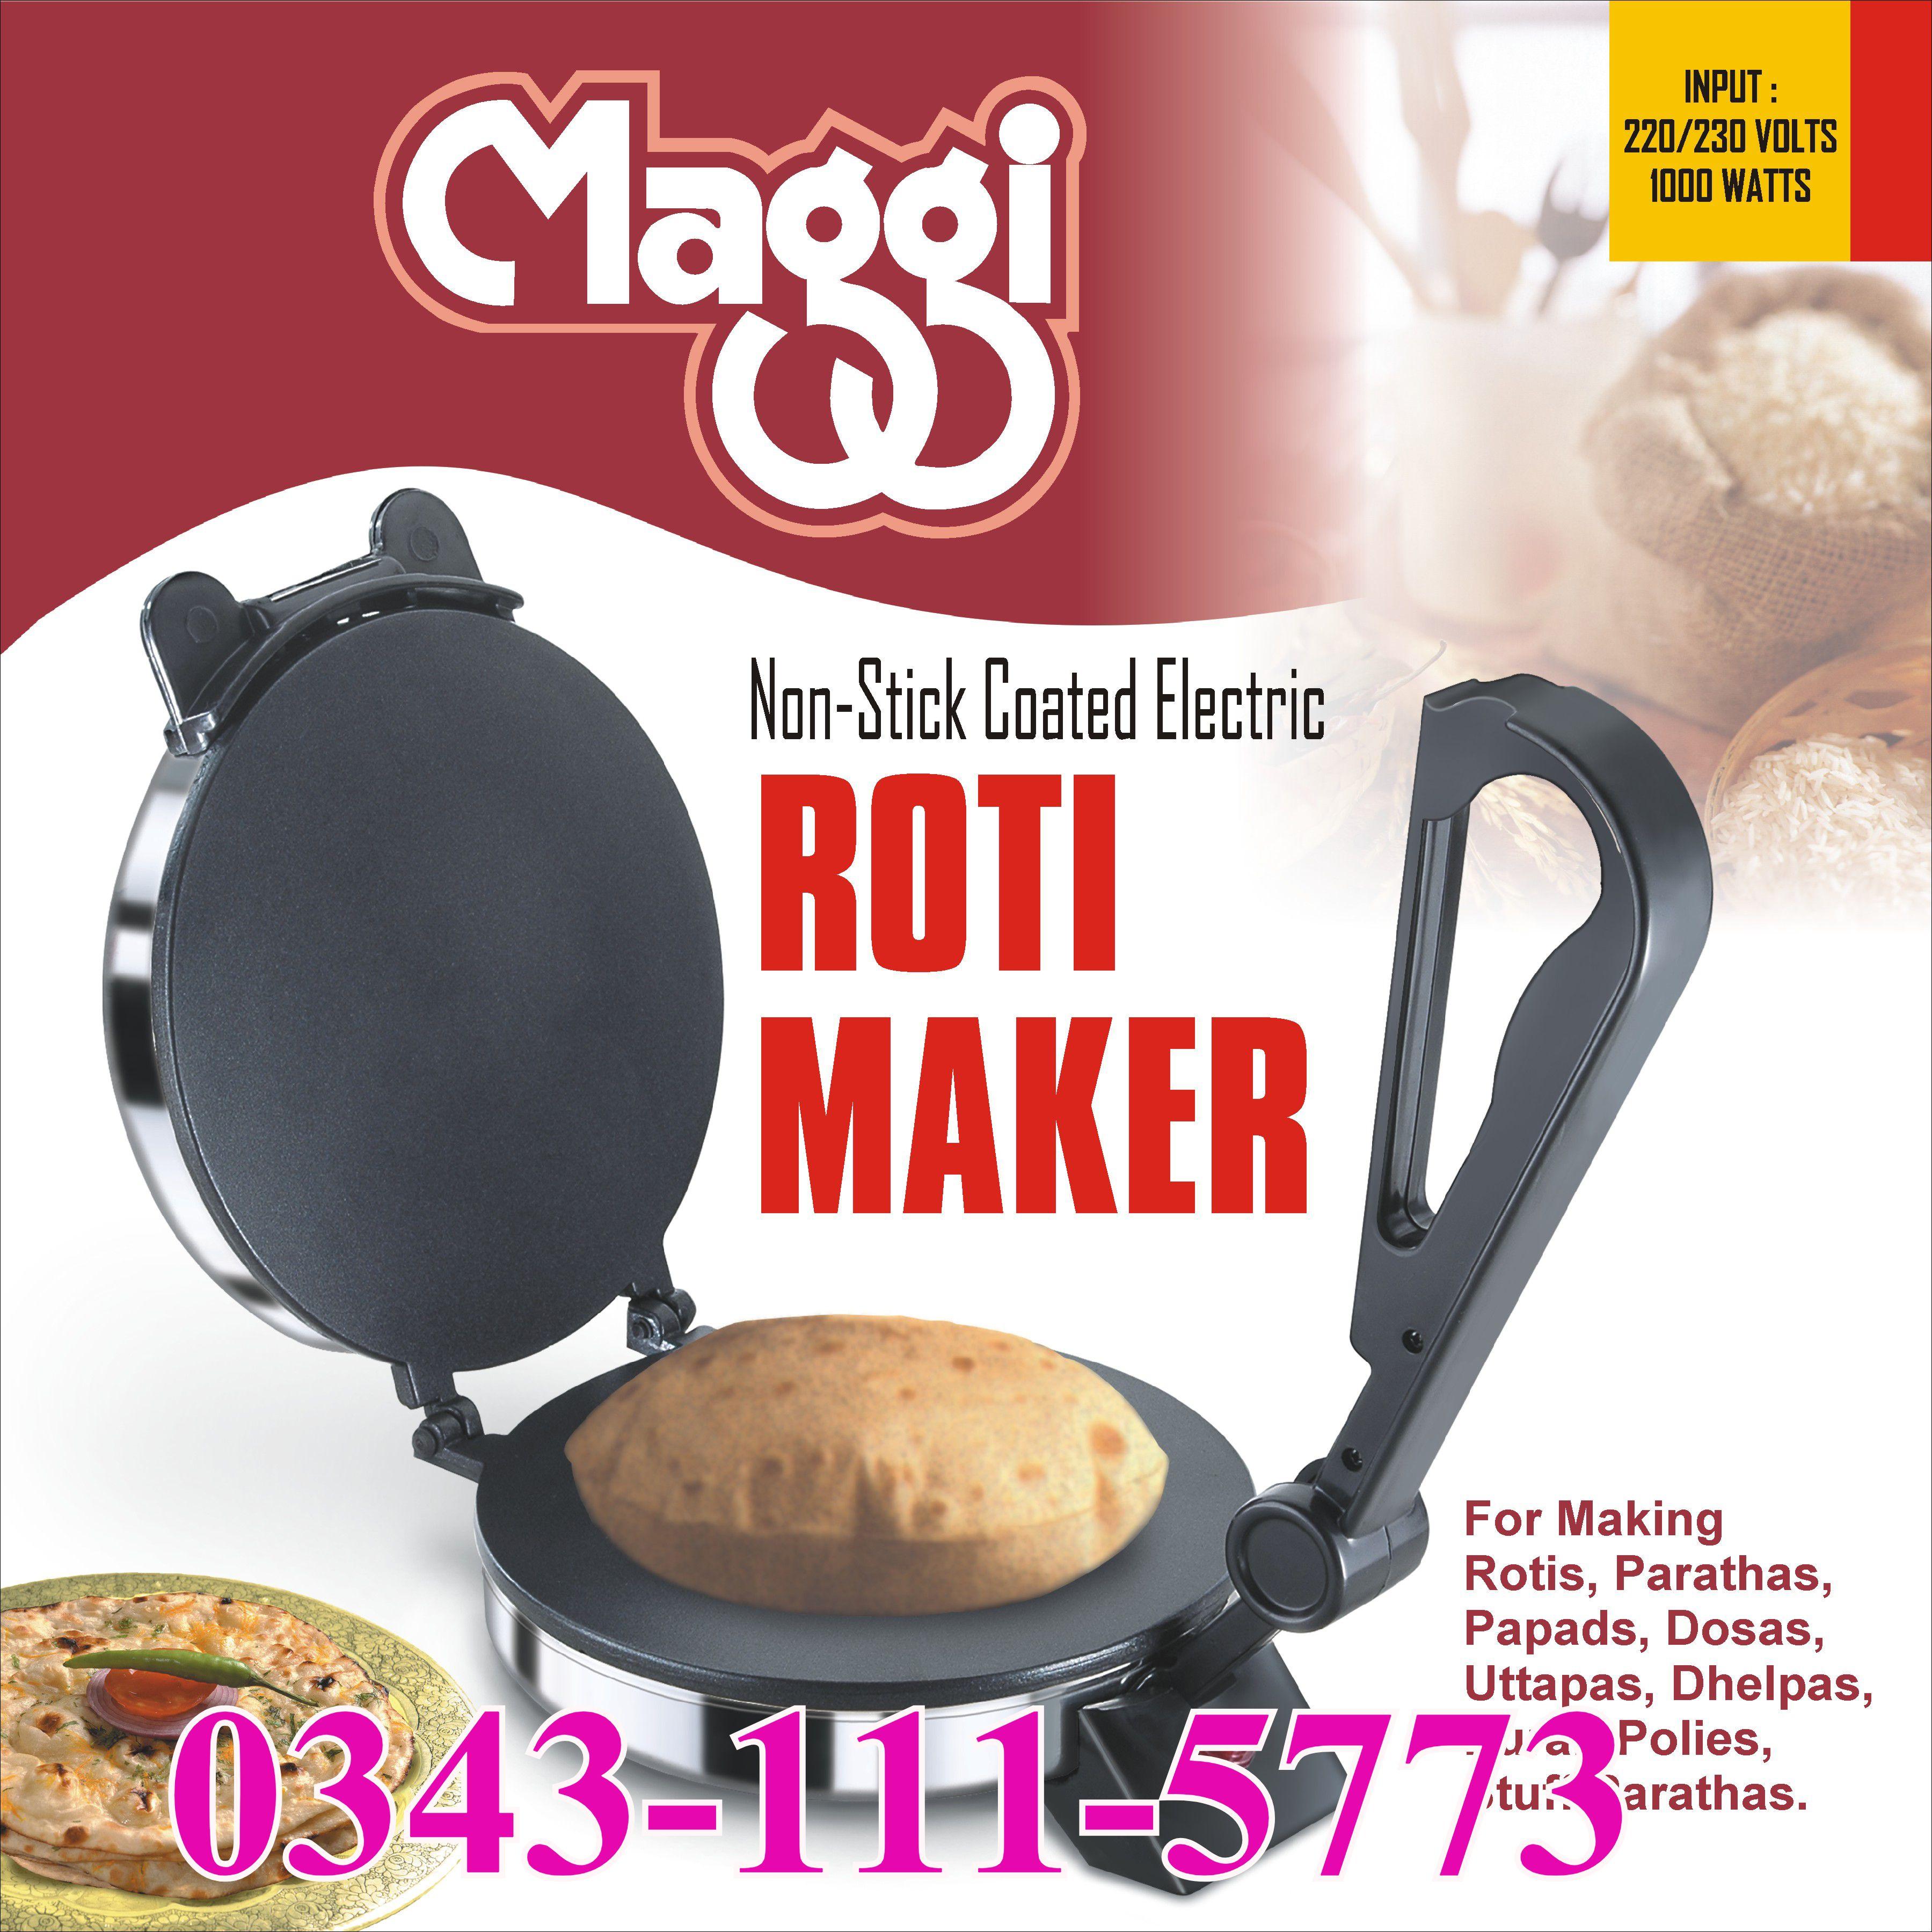 Electric Automatic Roti Maker Chappati Maker In Pakistan To Order